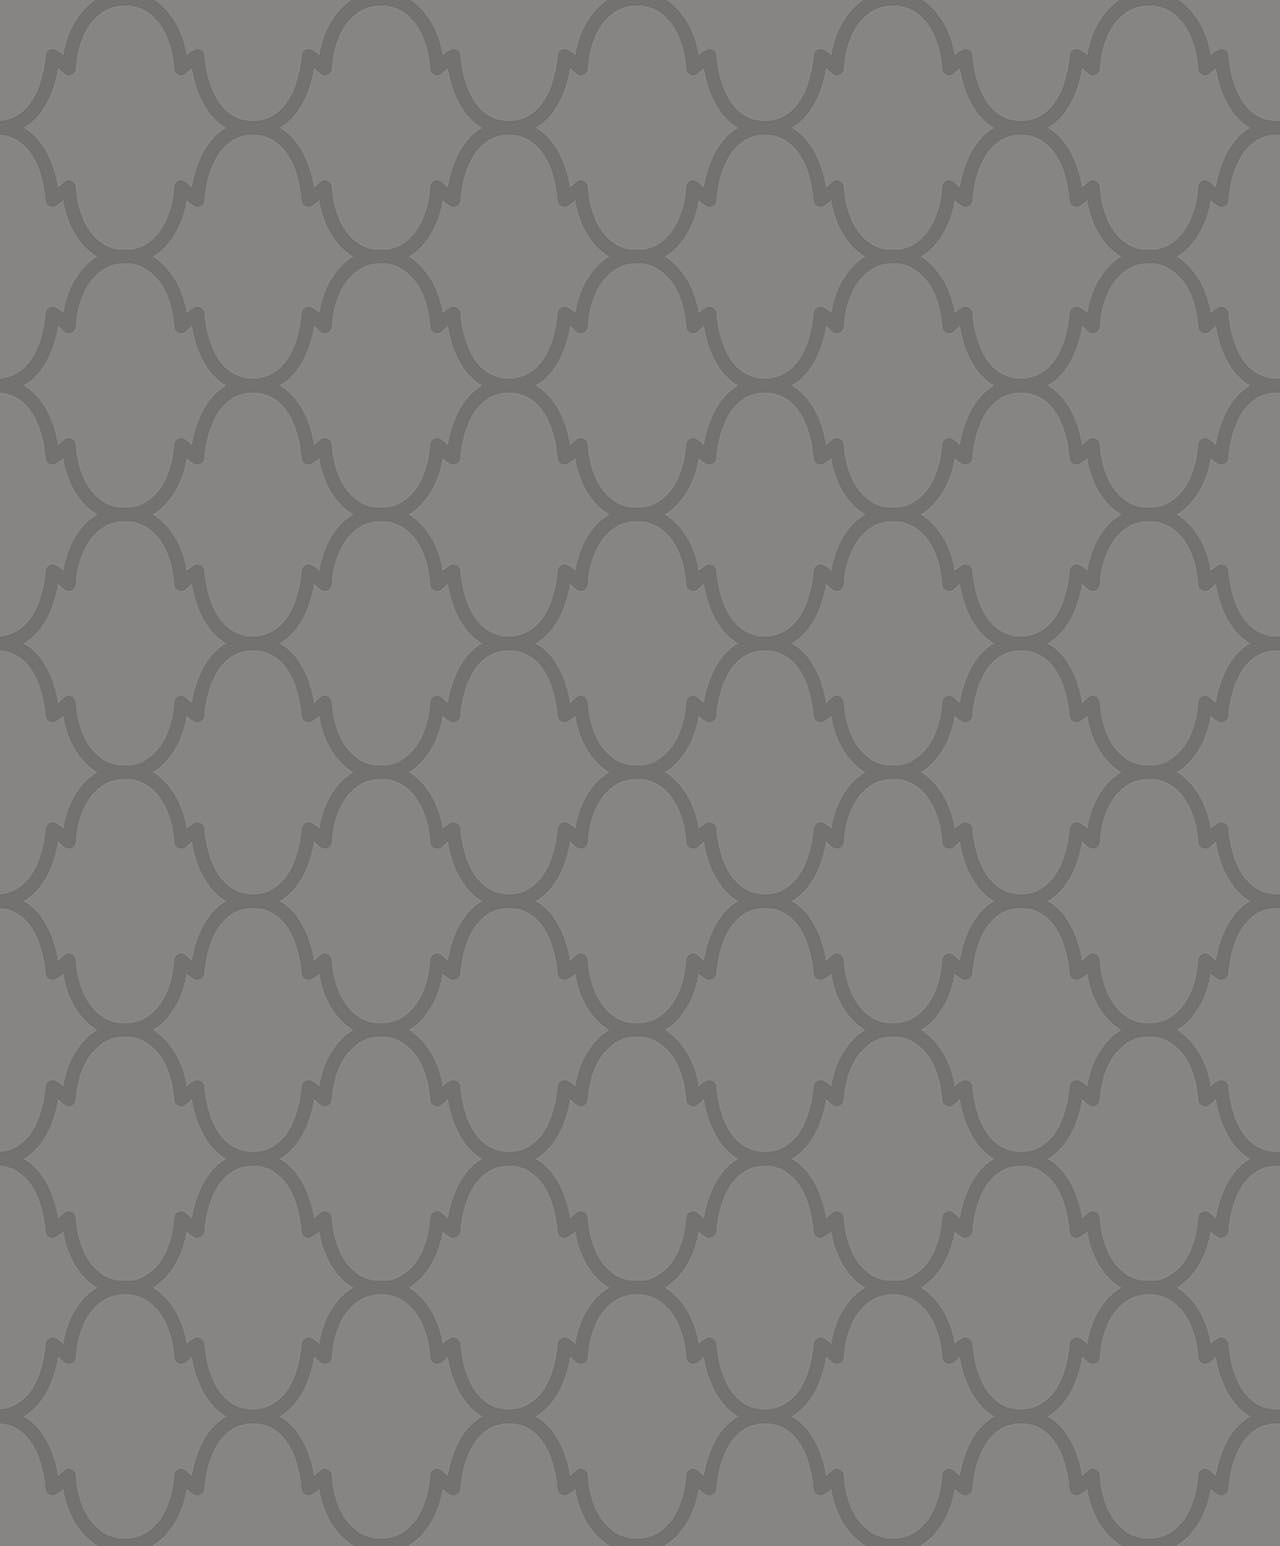 MARRAKESH GREY B decadence wallpaper-DC00158